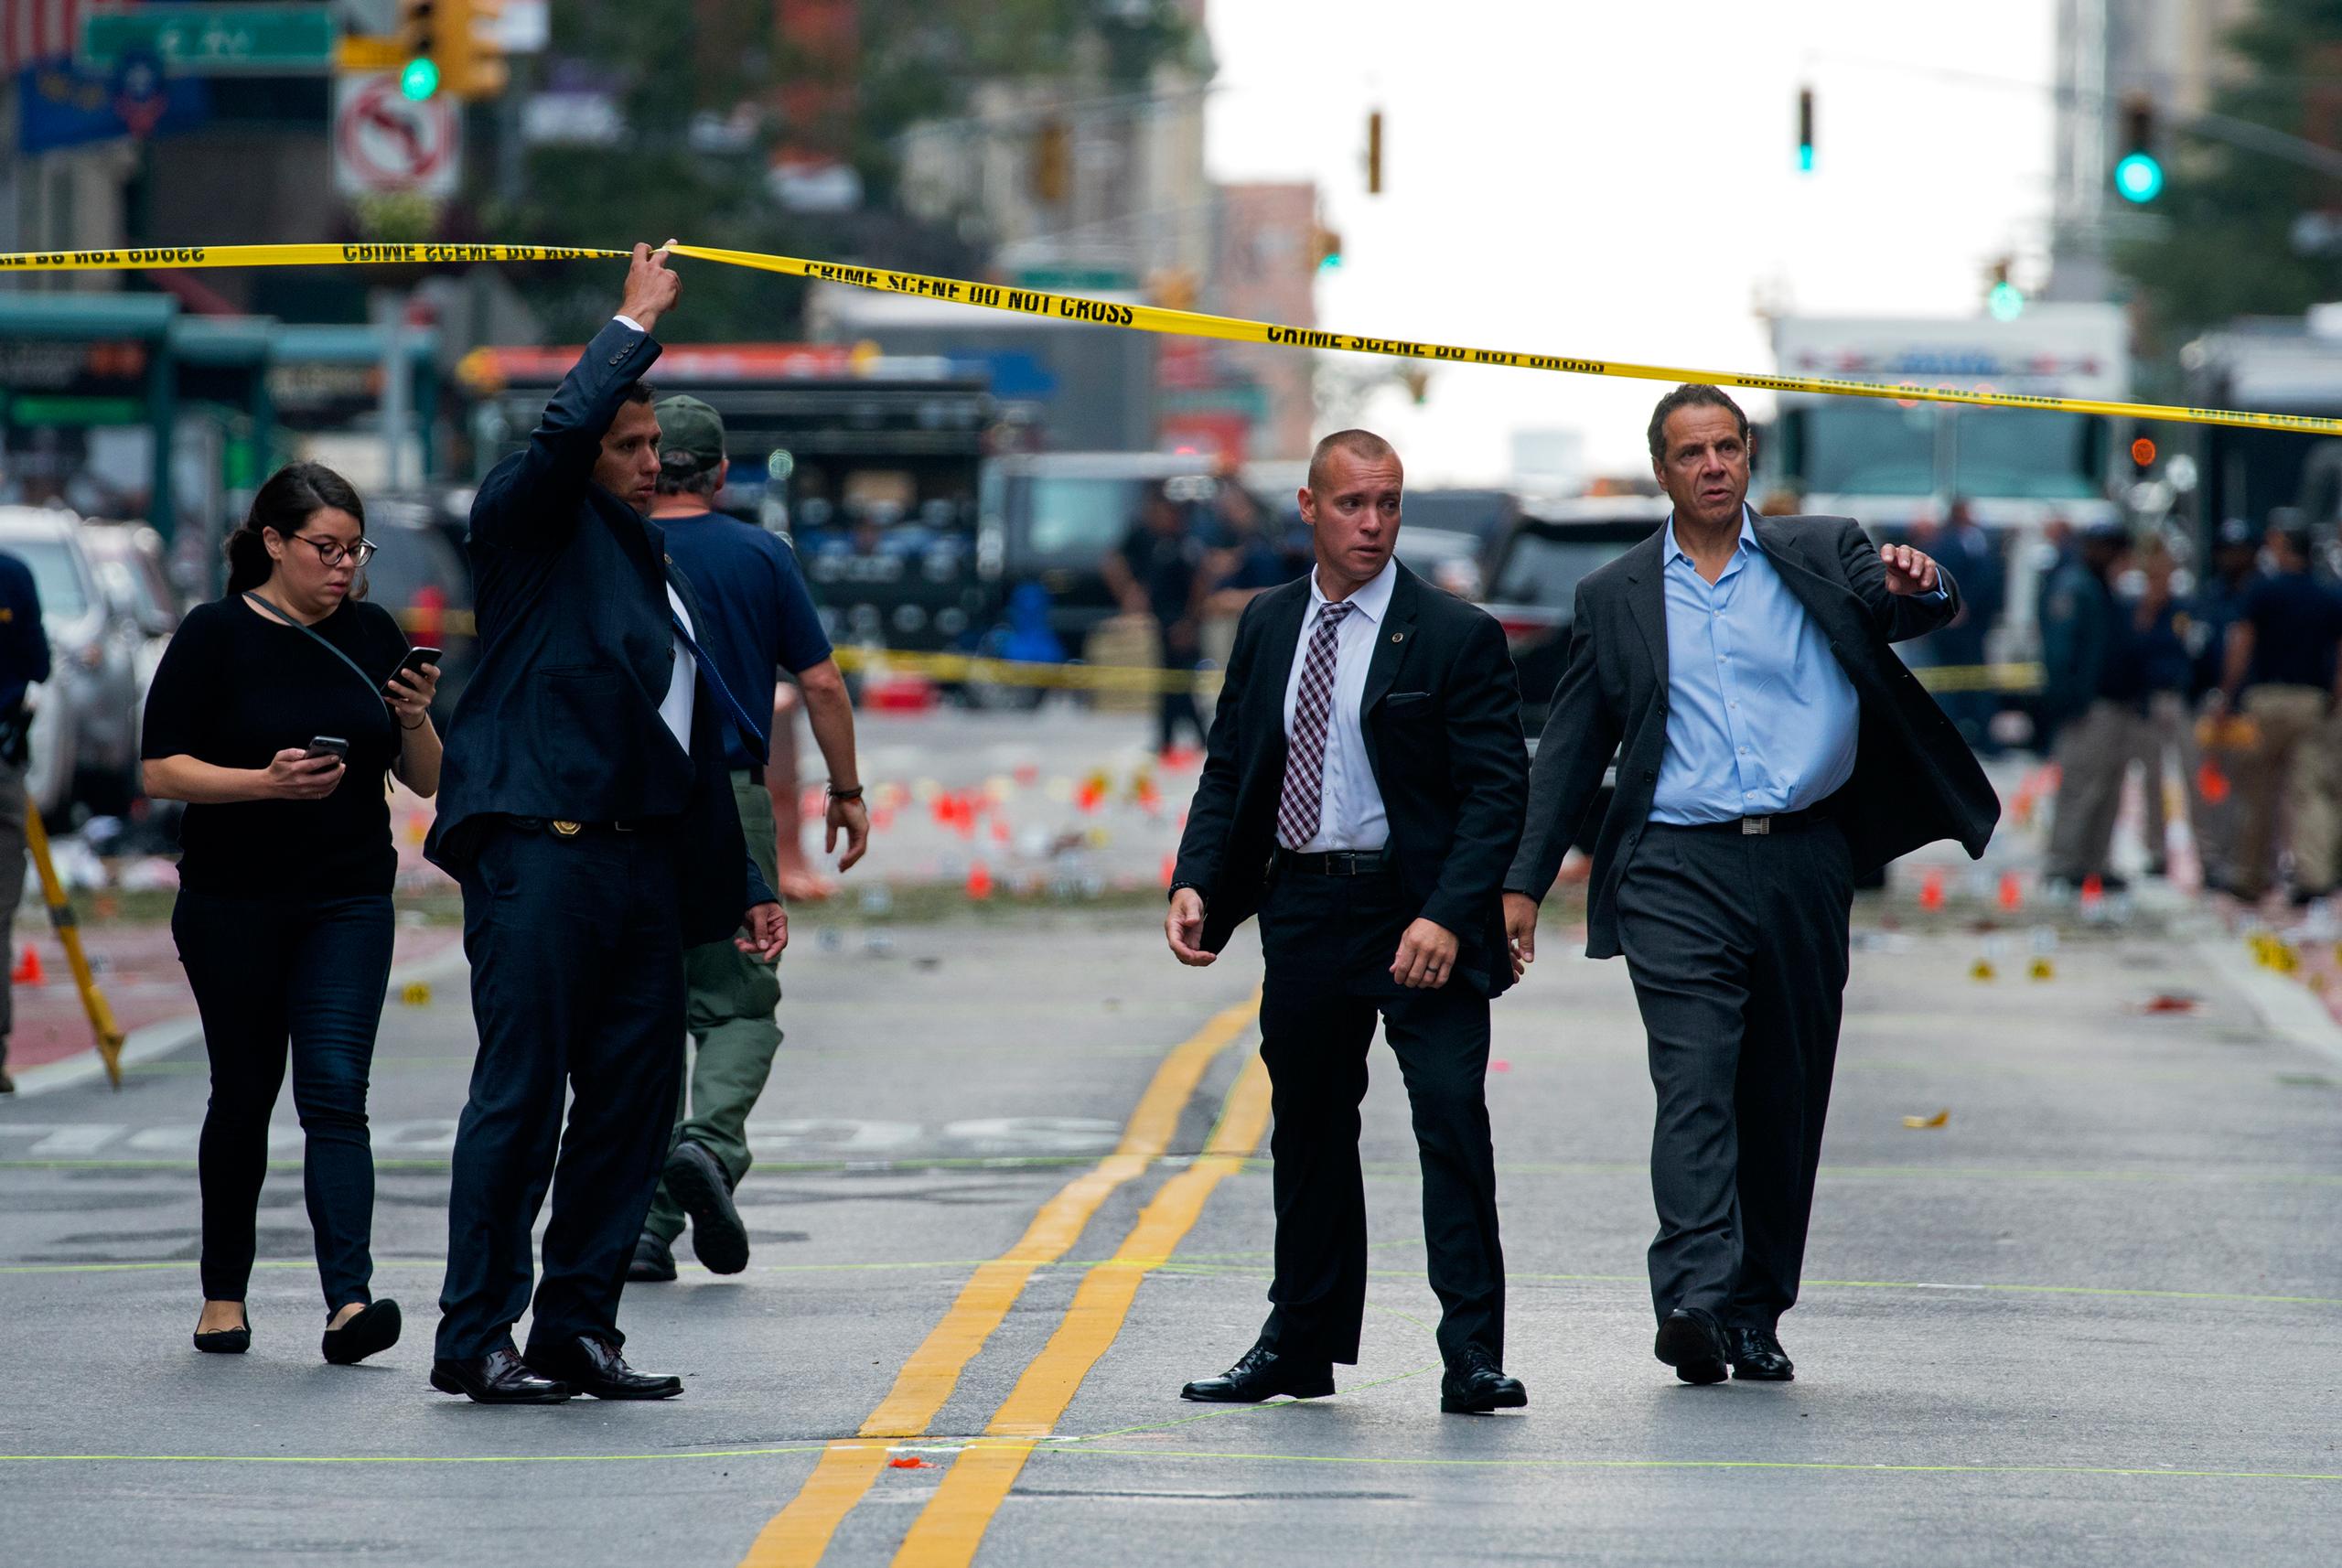 New York Gov. Andrew Cuomo, right, walks from the scene of an explosion in Manhattan's Chelsea neighborhood in New York on Sept. 18, 2016.